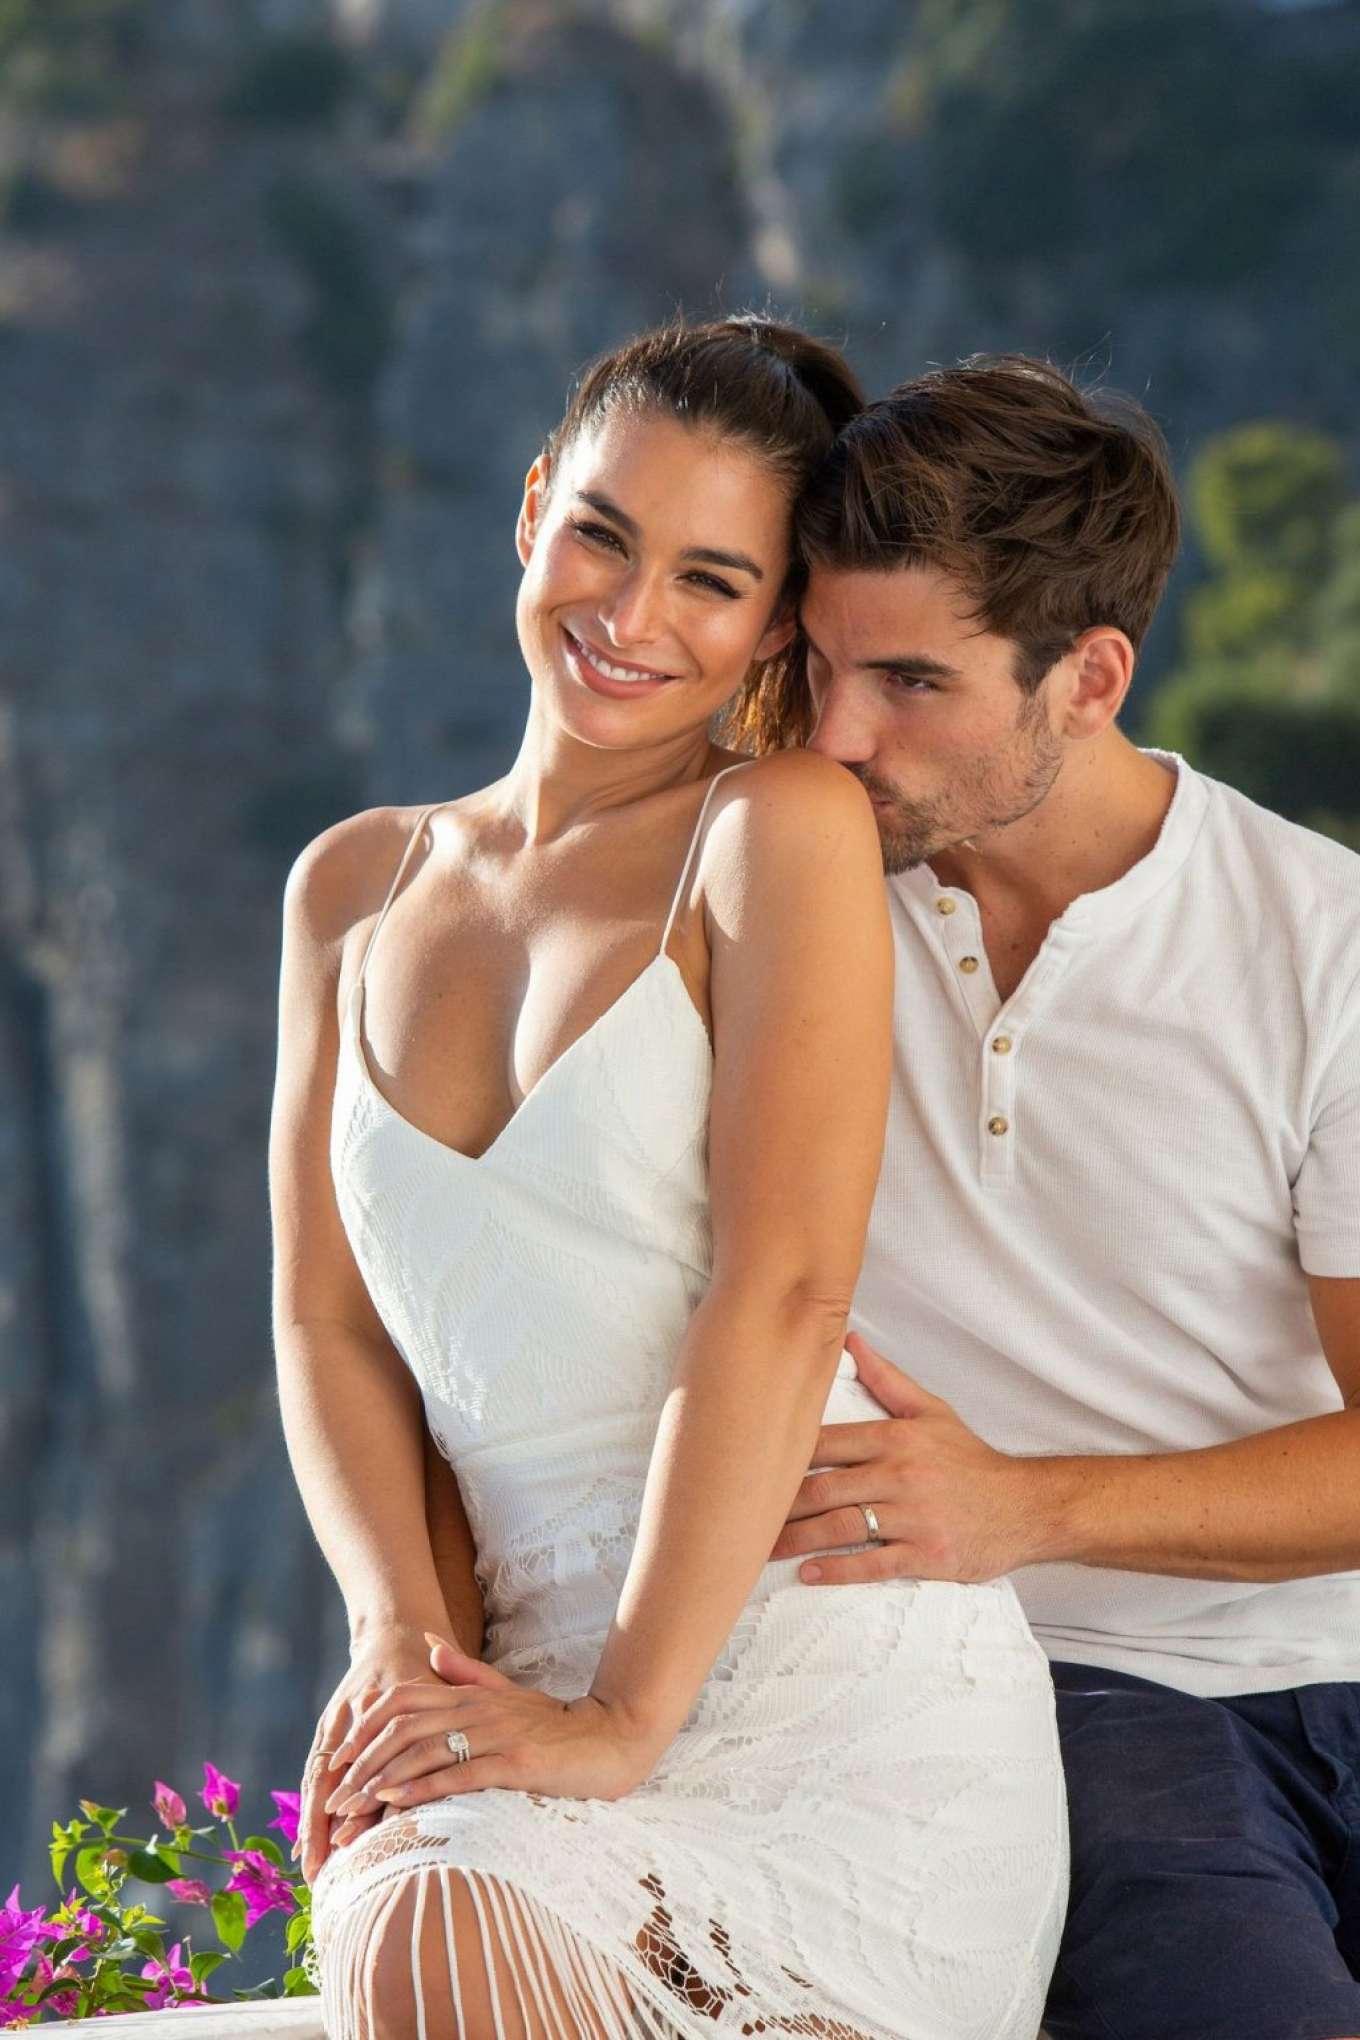 Ashley Iaconetti and Jared Haibon on their honeymoon